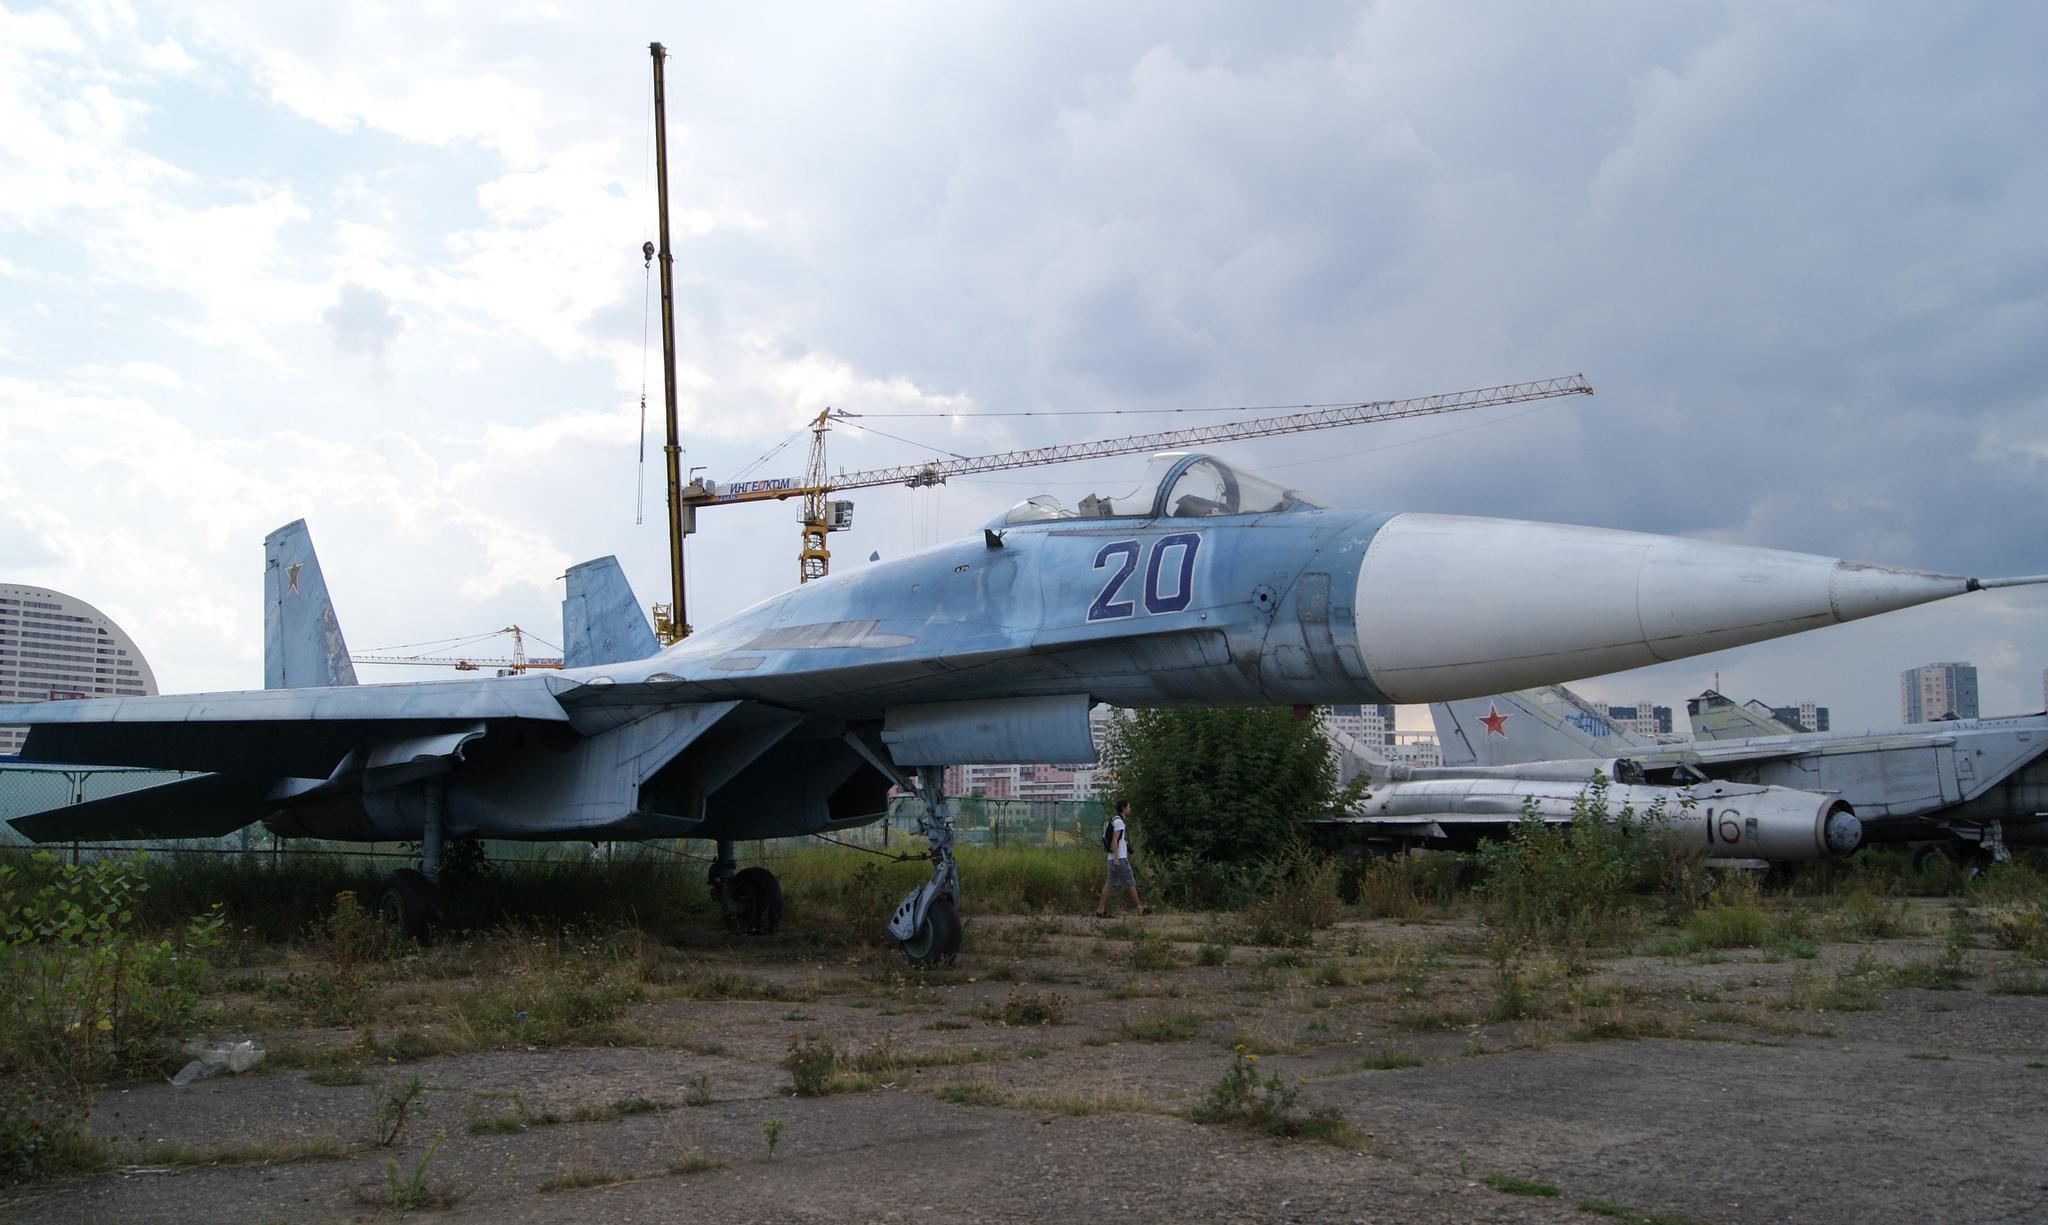 Sukhoi Su-27, reportedly a prototype. (Image Credit: Sergey Rodovnichenko, CC 3.0)